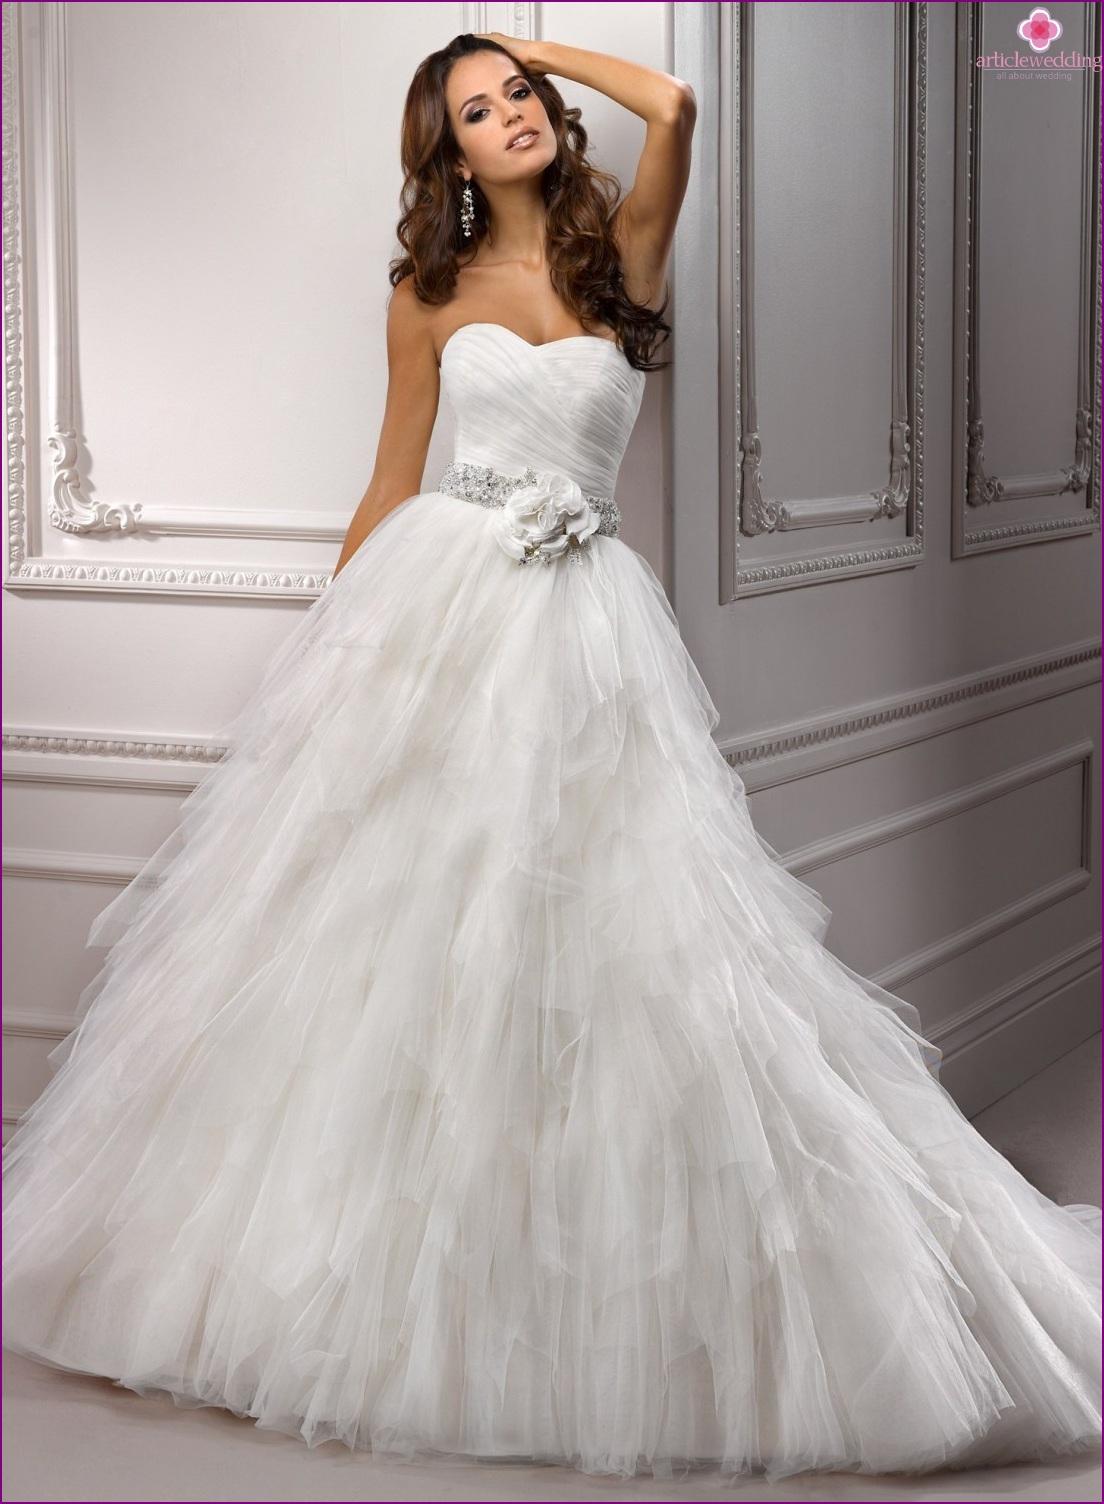 Princess Balloon Wedding Dress